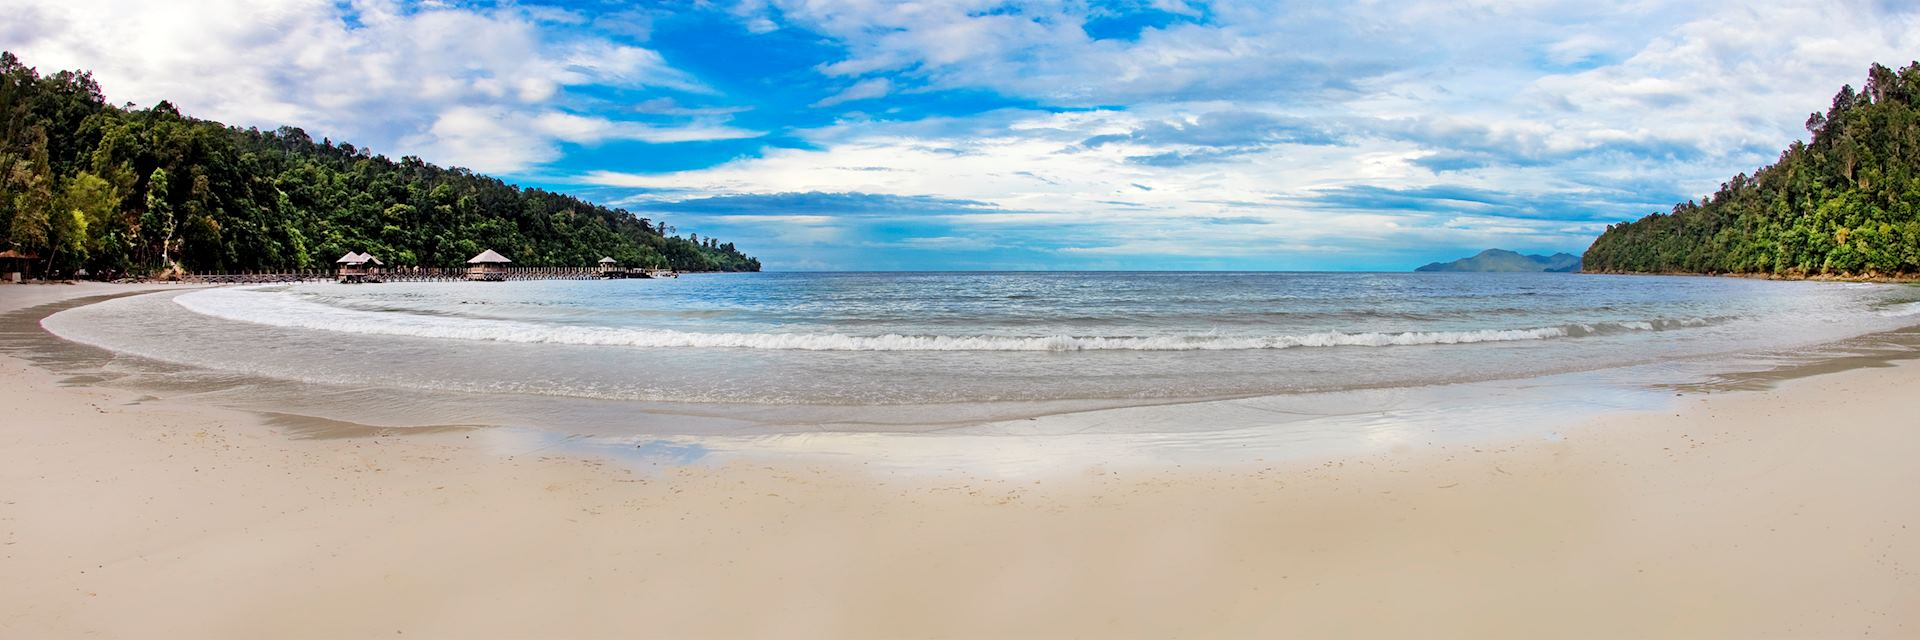 Bunga Raya Island Resort on Gaya Island